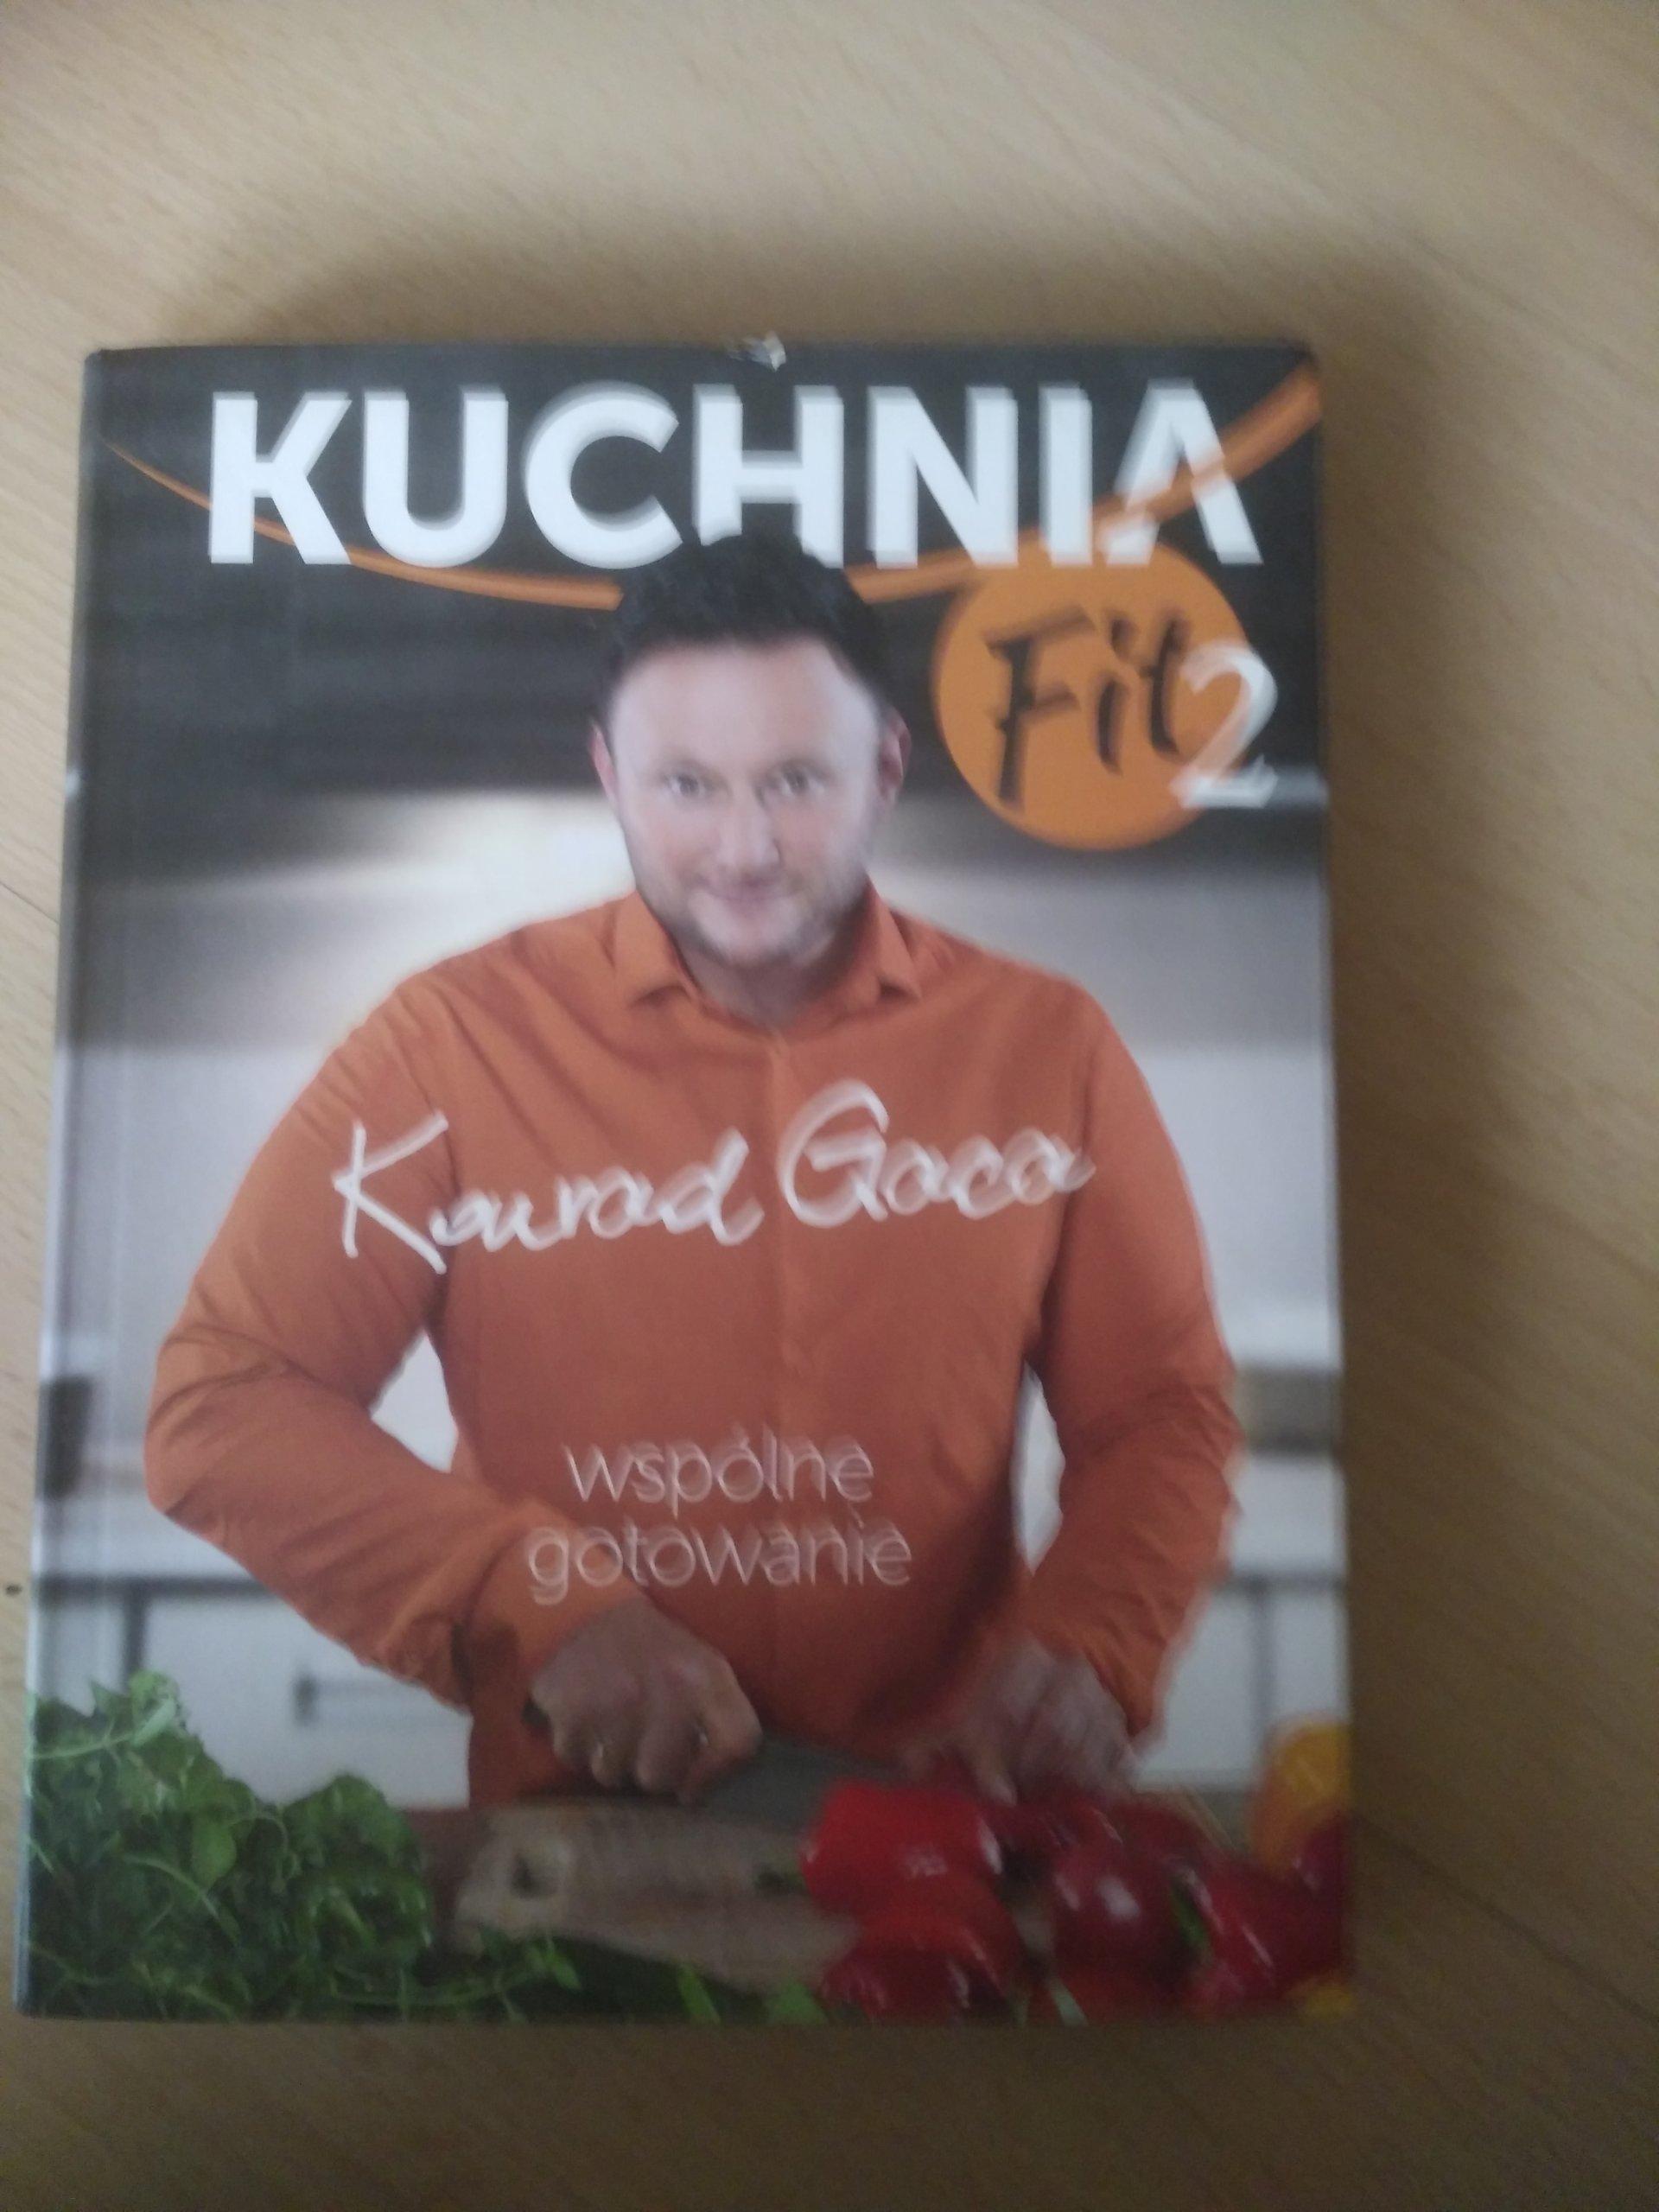 Kuchnia Fit 2 Konrad Gaca 7204175707 Oficjalne Archiwum Allegro